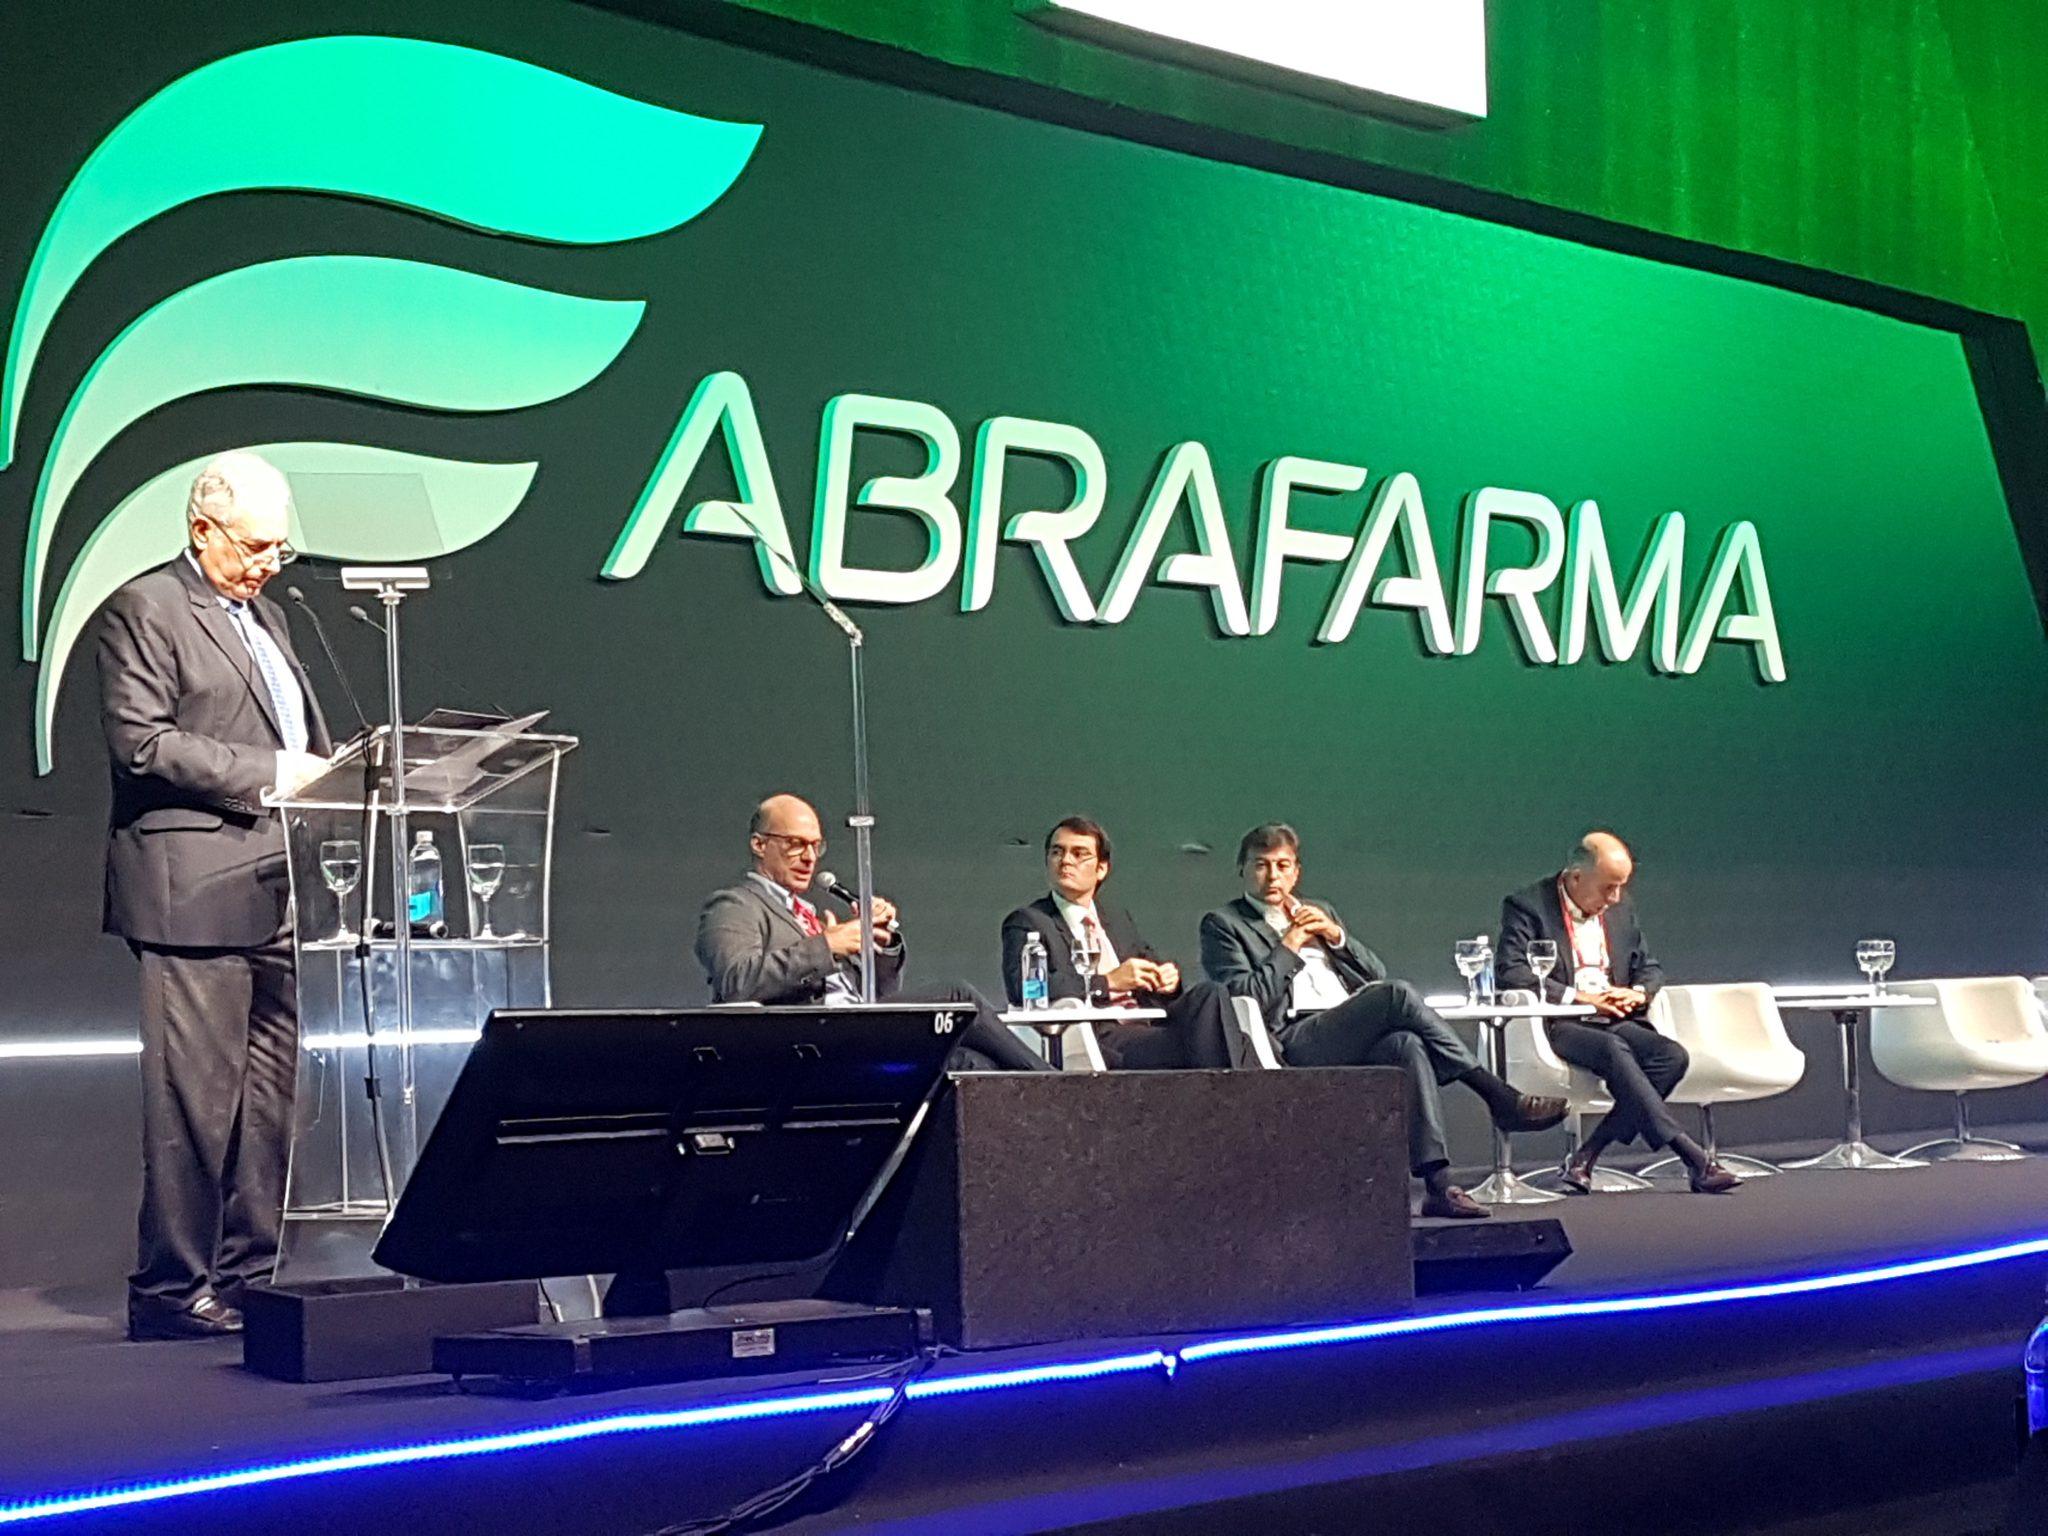 Abrafarma Future Trends